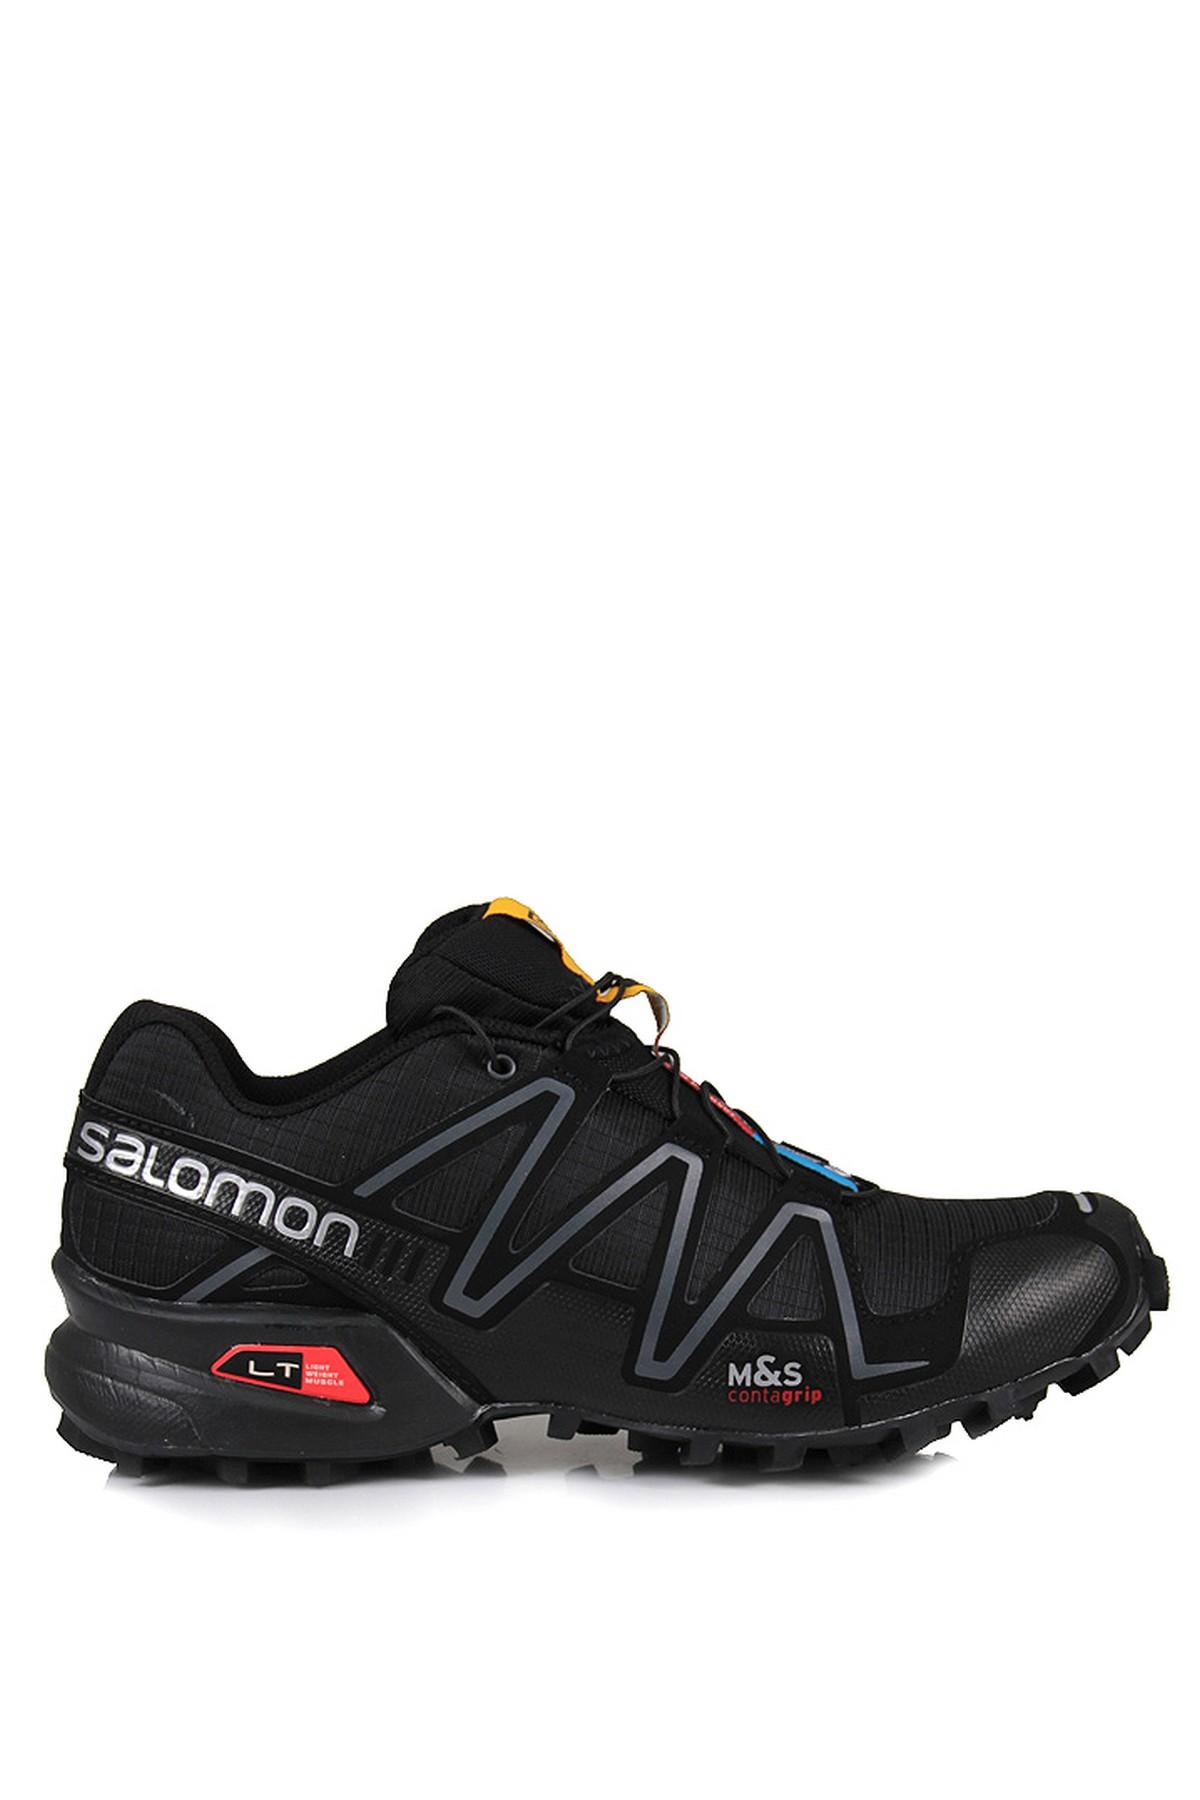 Salomon L32784500